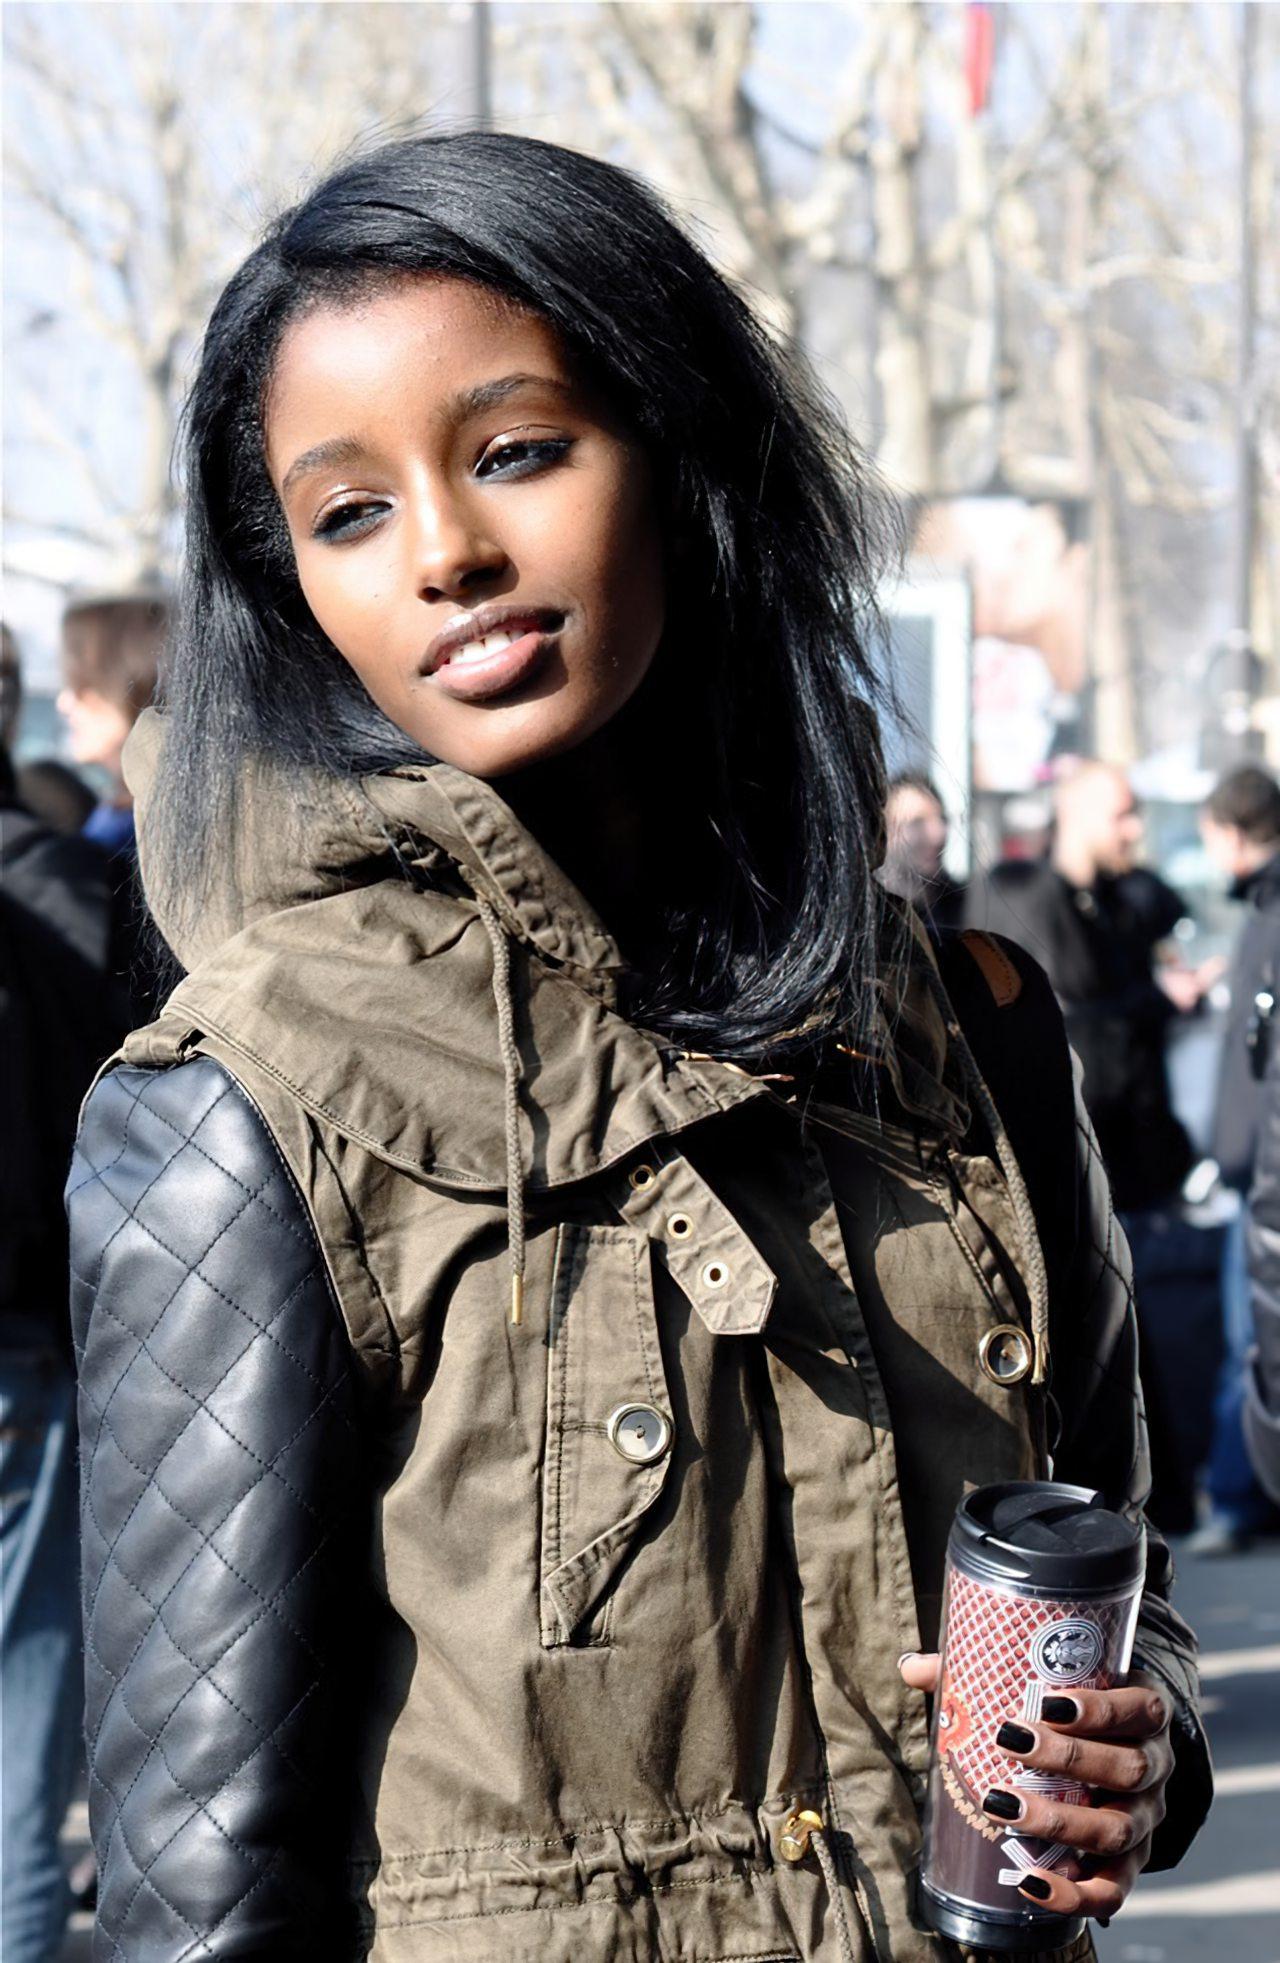 Mulheres Negras Bonitas (17)